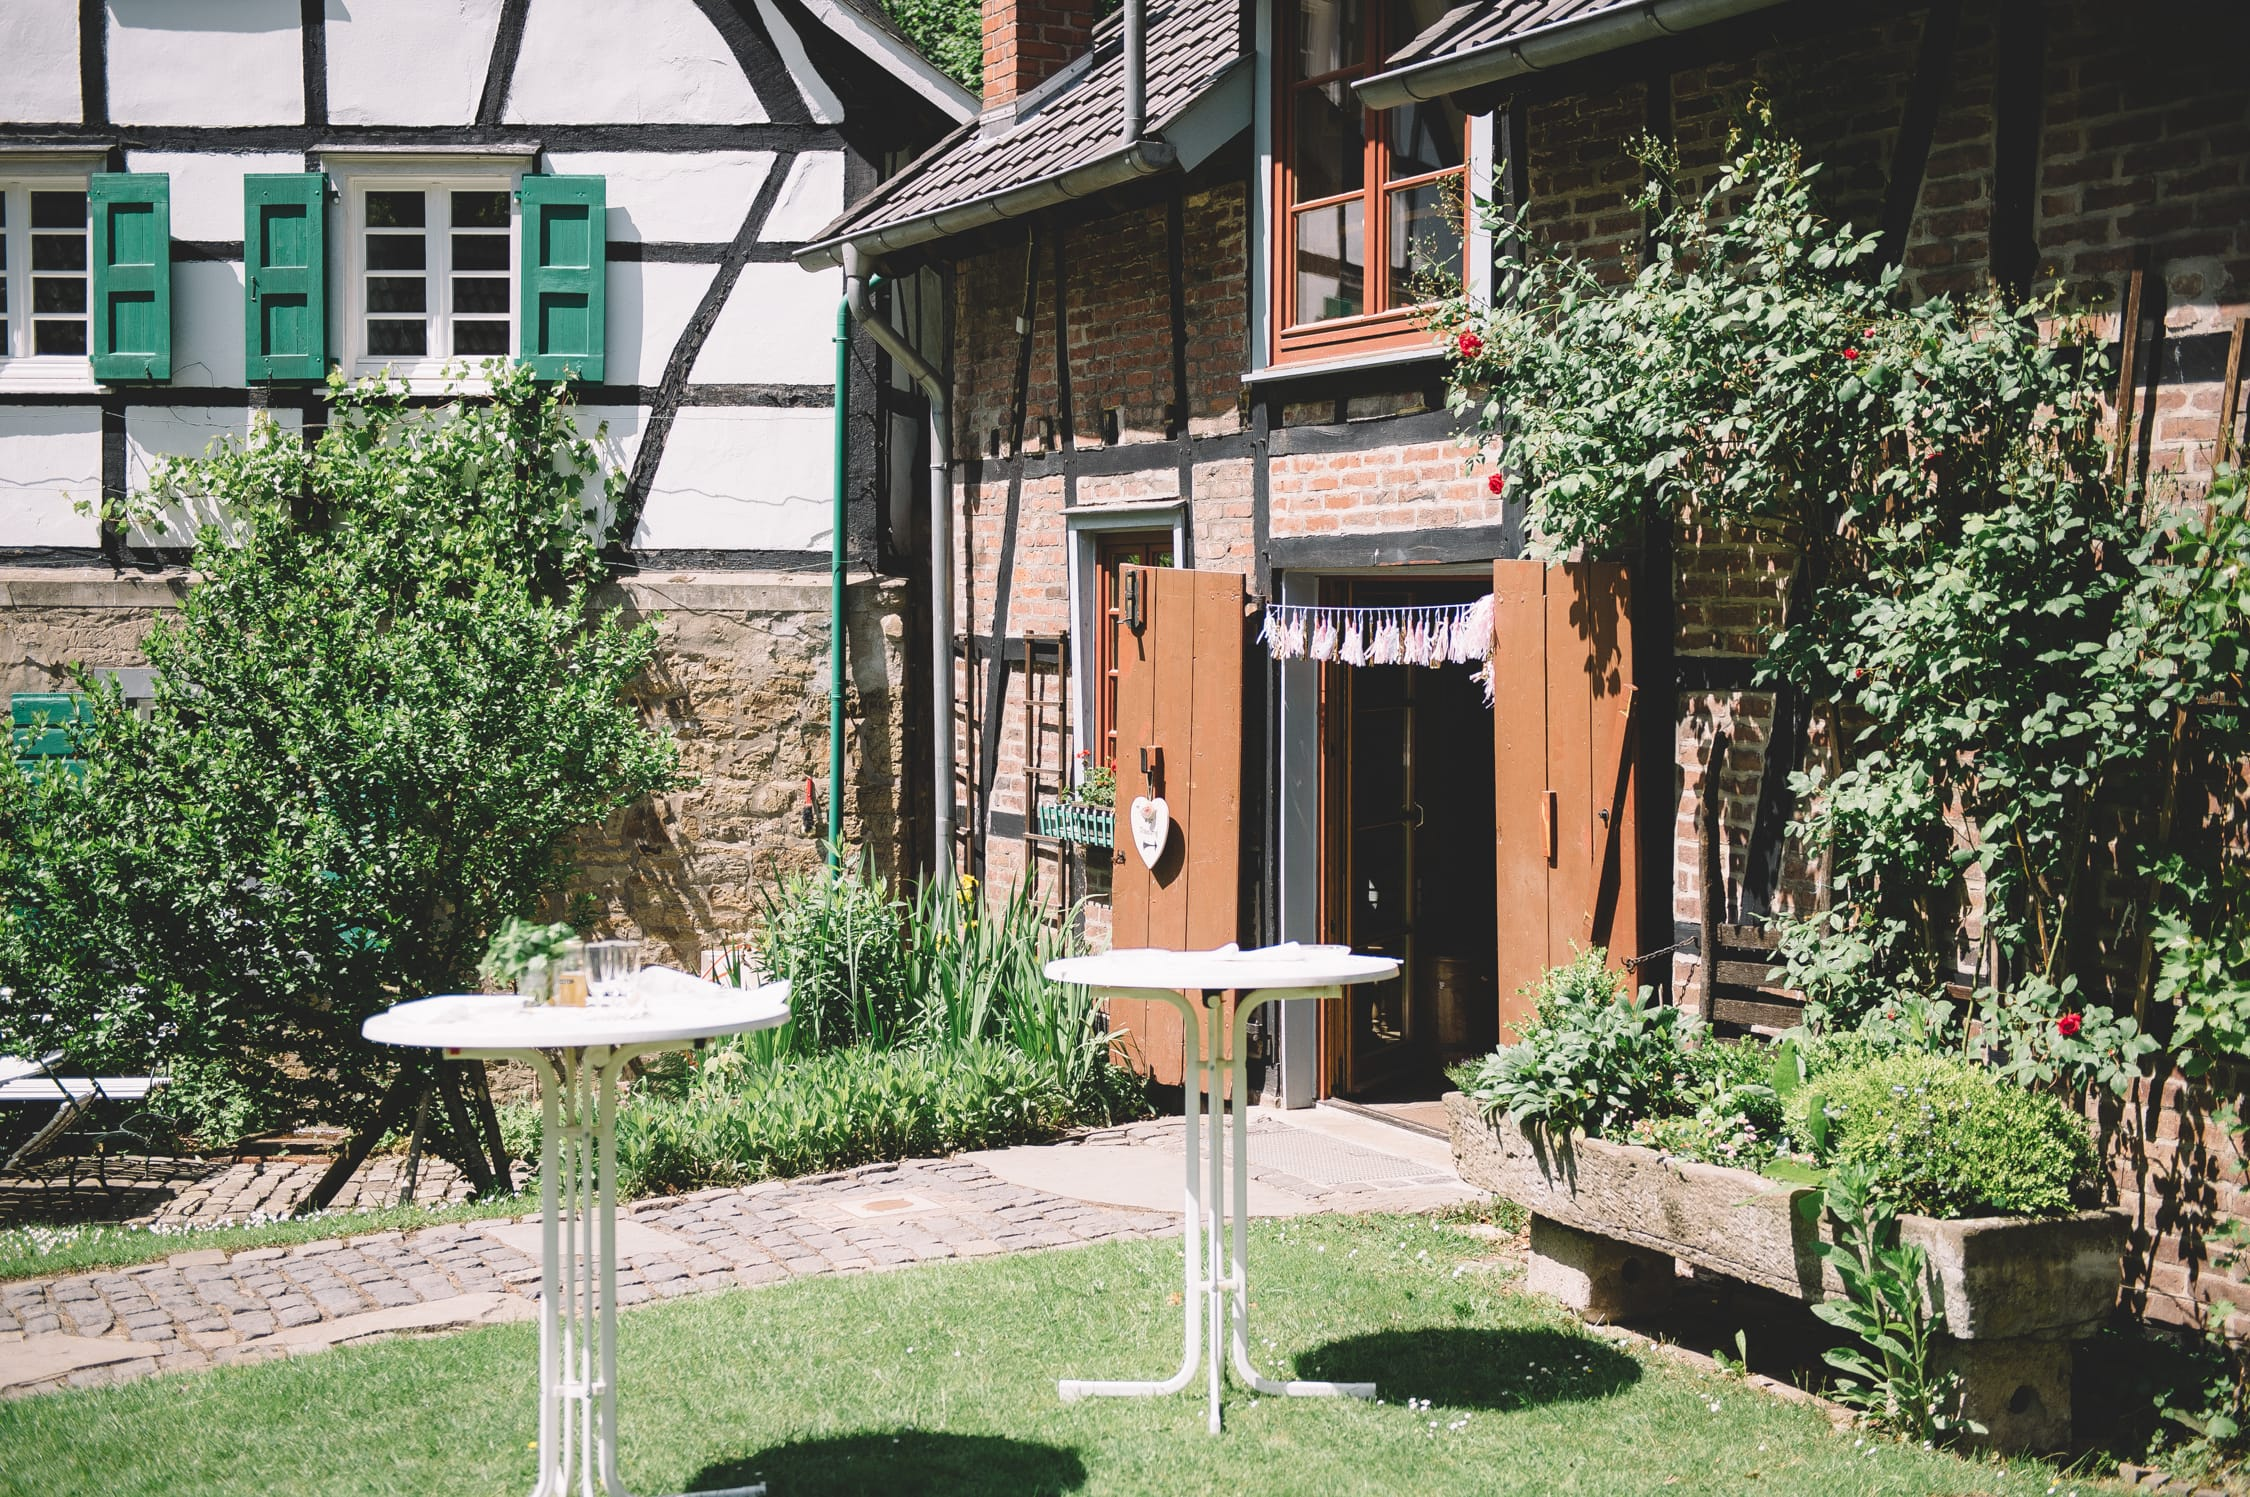 Lambertsmühle-Burscheid-standesamt-02